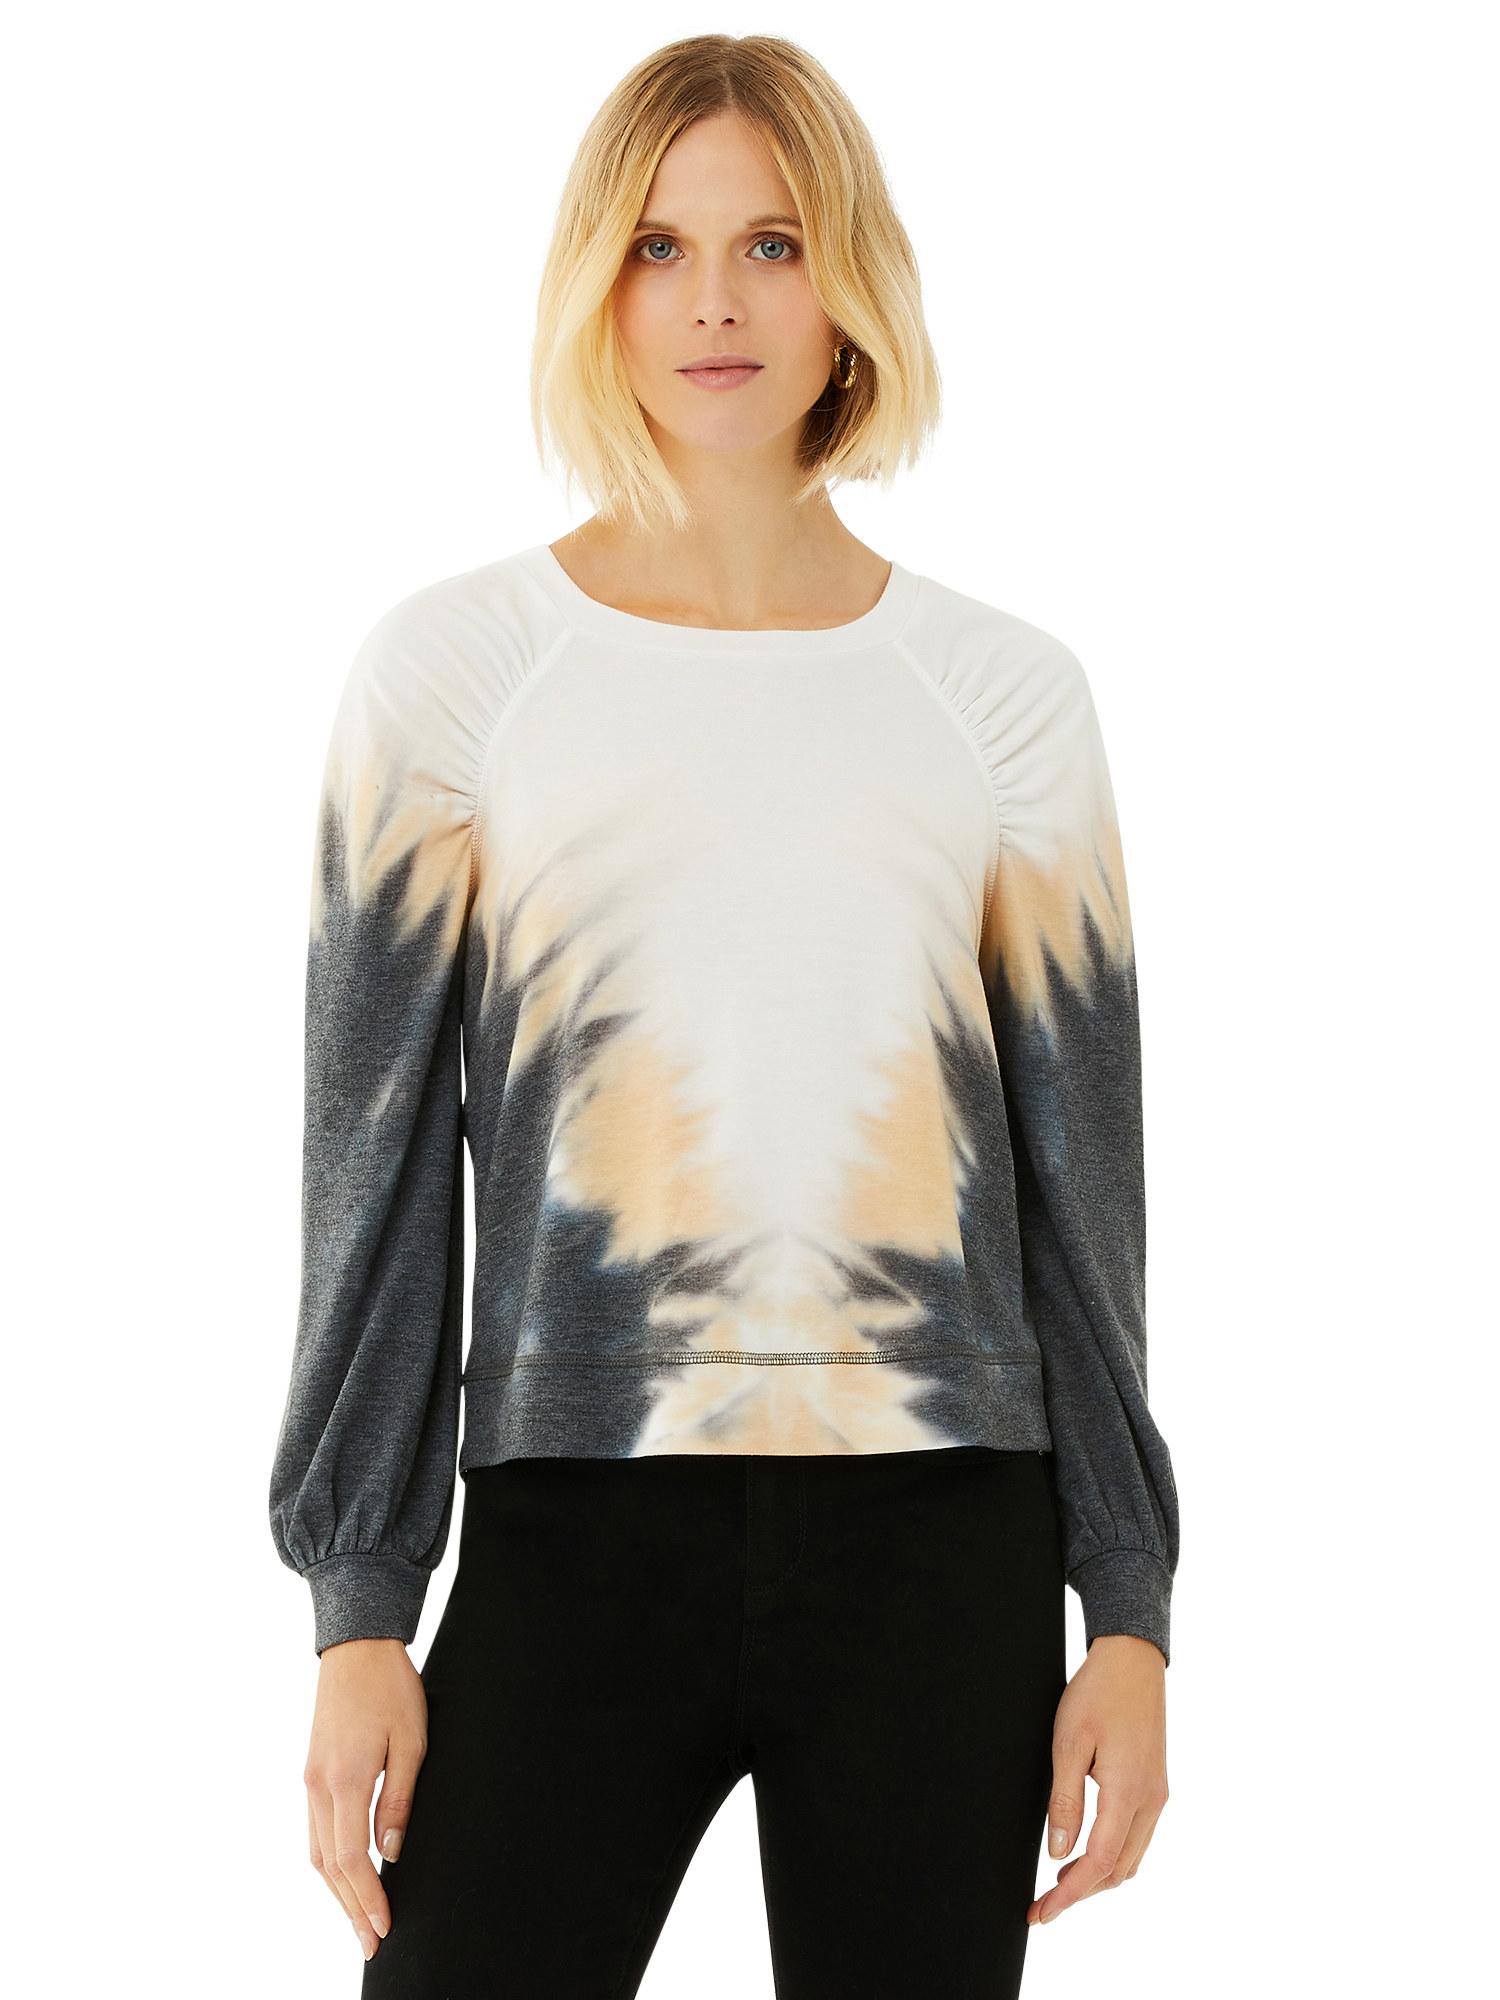 Model in tie dye sweatshirt with balloon sleeves